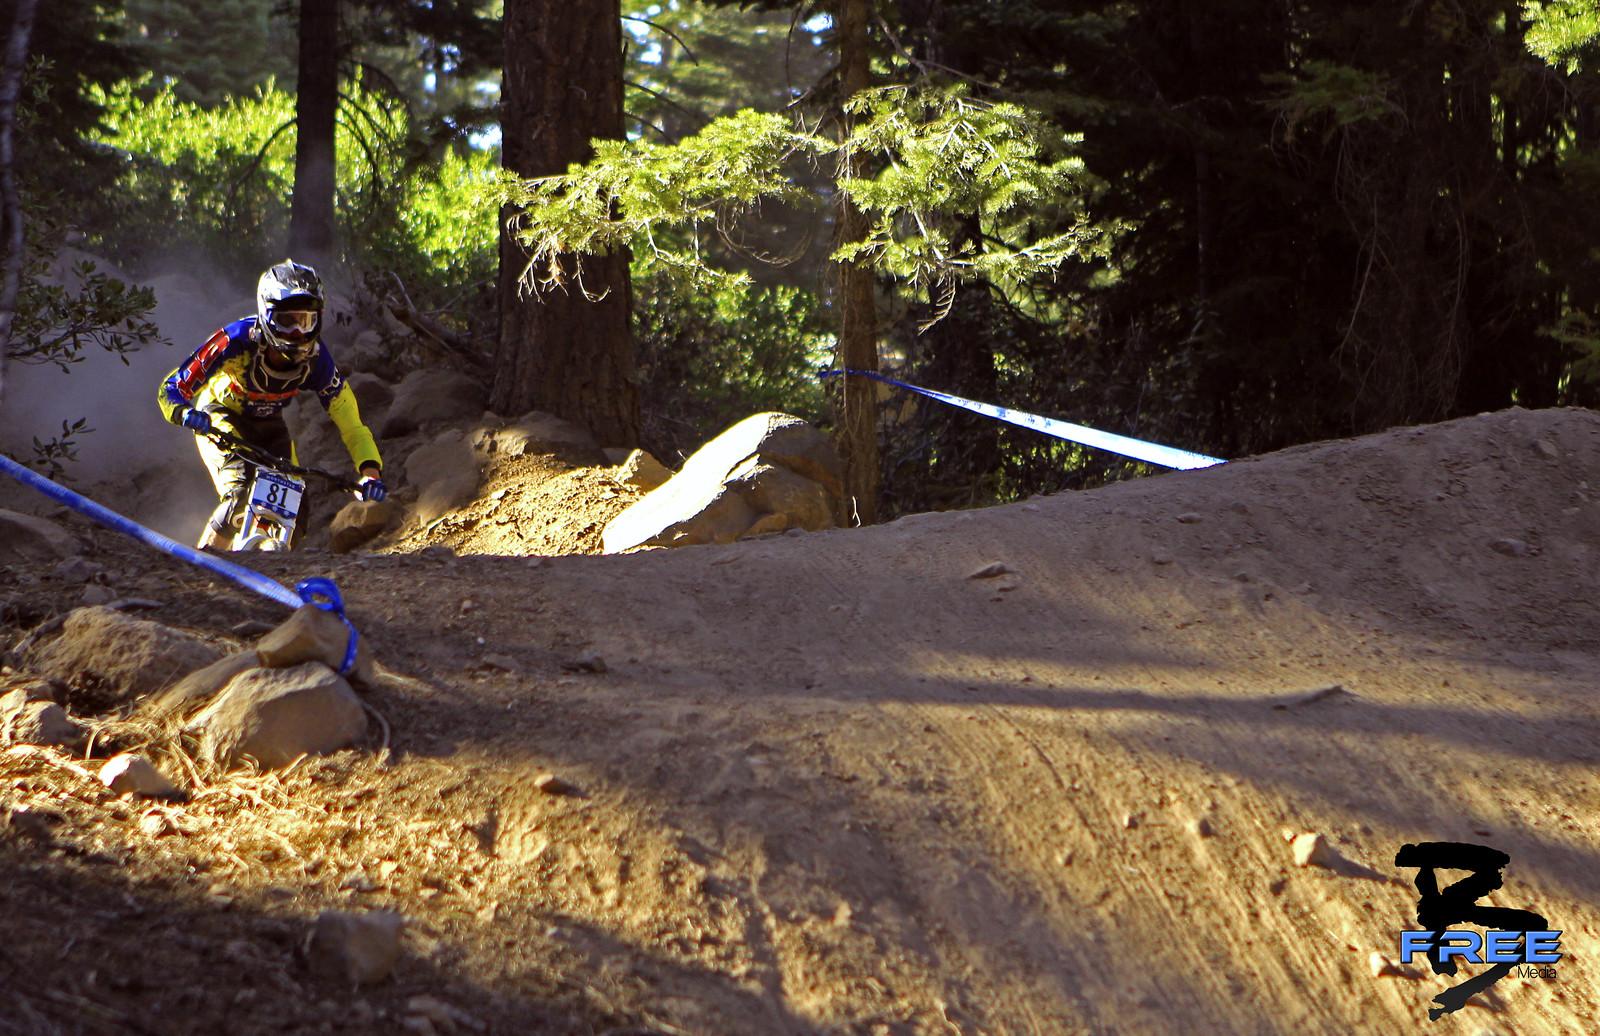 done7 - GnarHuck - Mountain Biking Pictures - Vital MTB